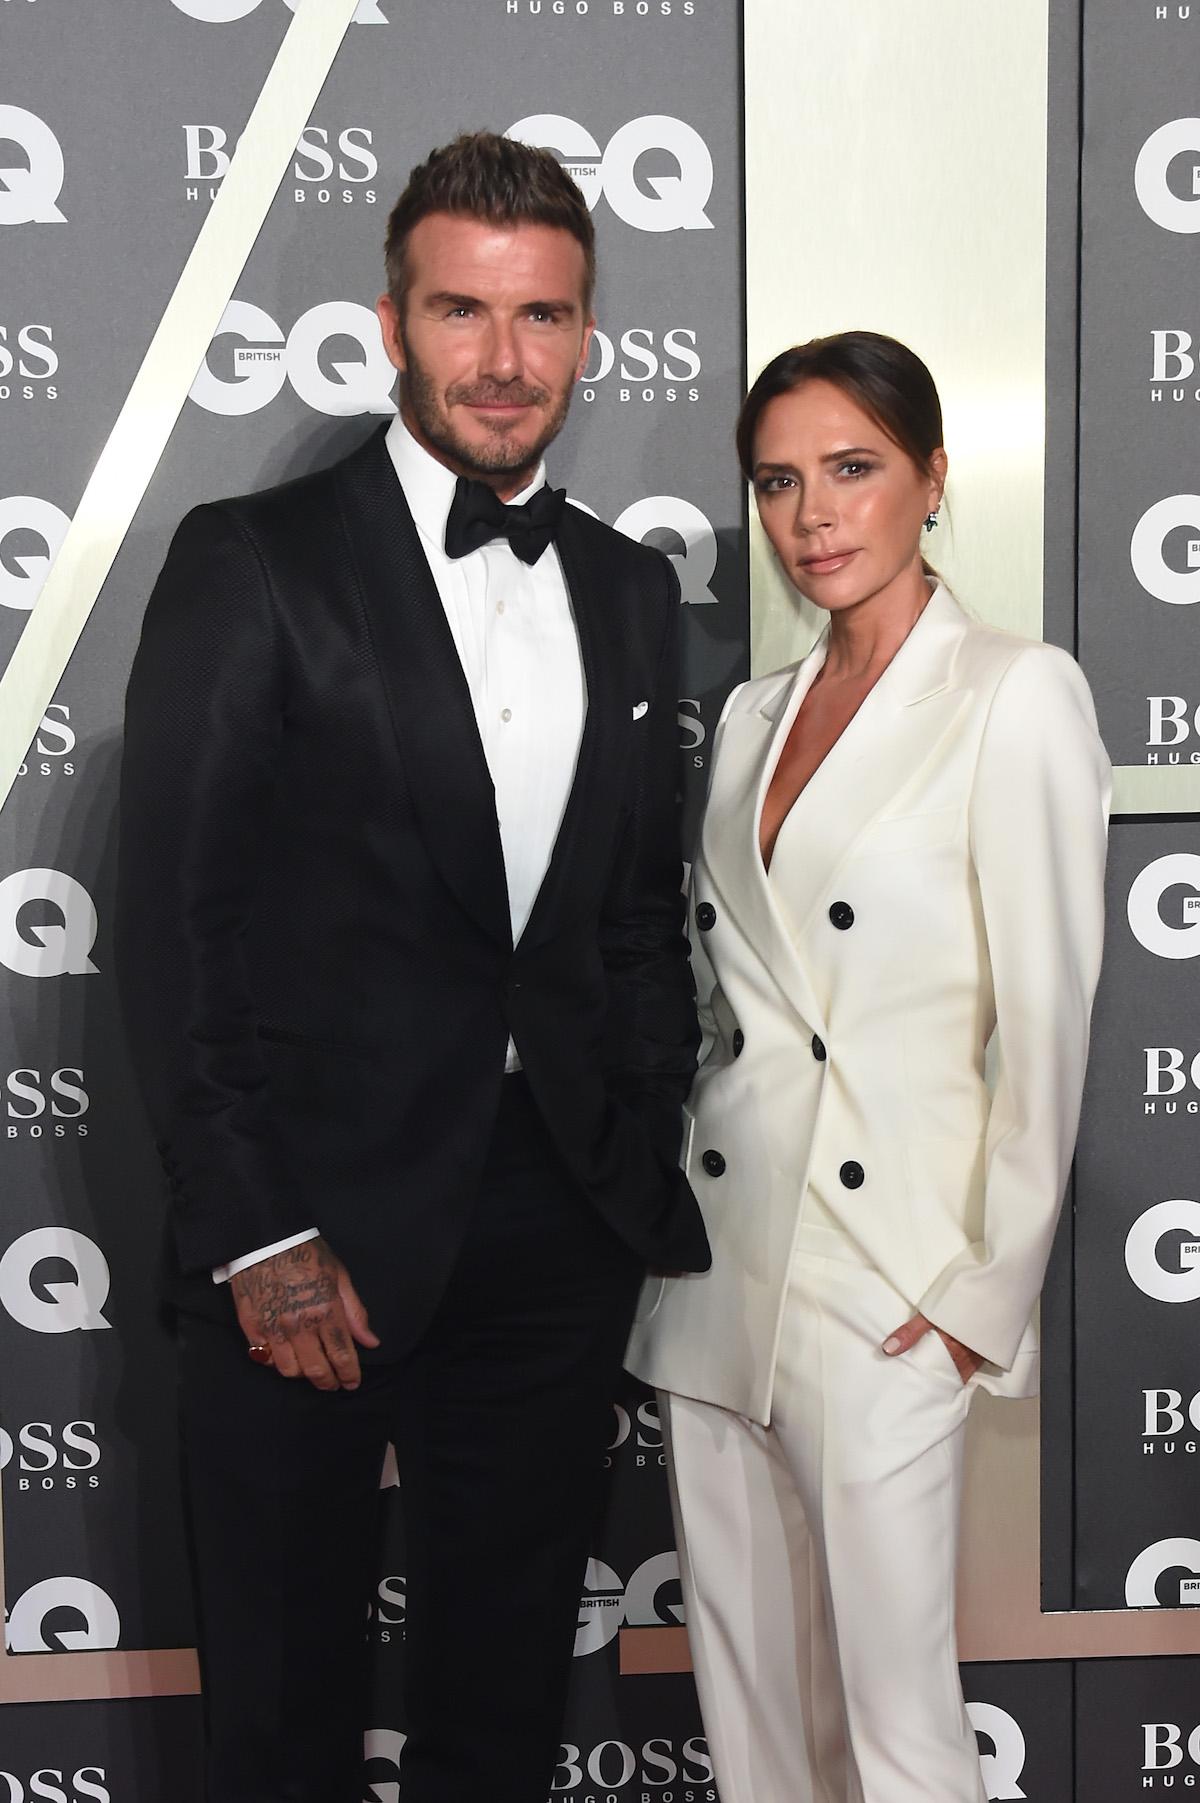 David Beckham and Victoria Beckham pose together at an event.